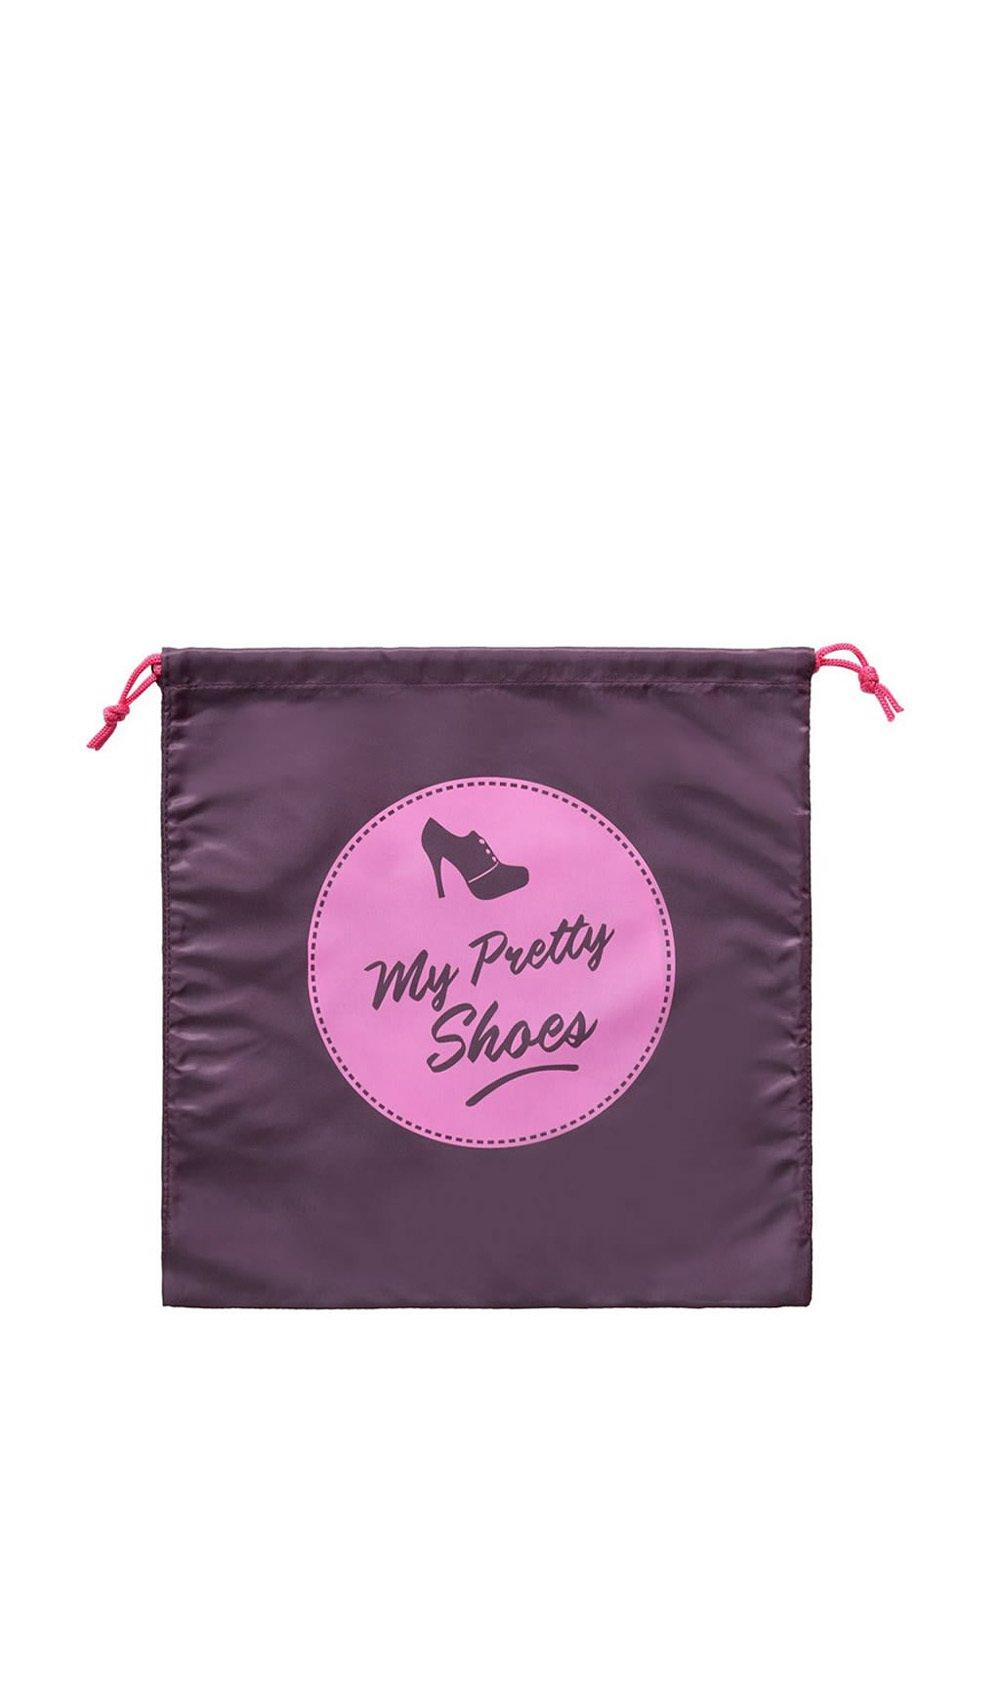 Cathy ds paris Clutch bag MY PRETTY SHOES Dark purple Women Spring/Summer Collection